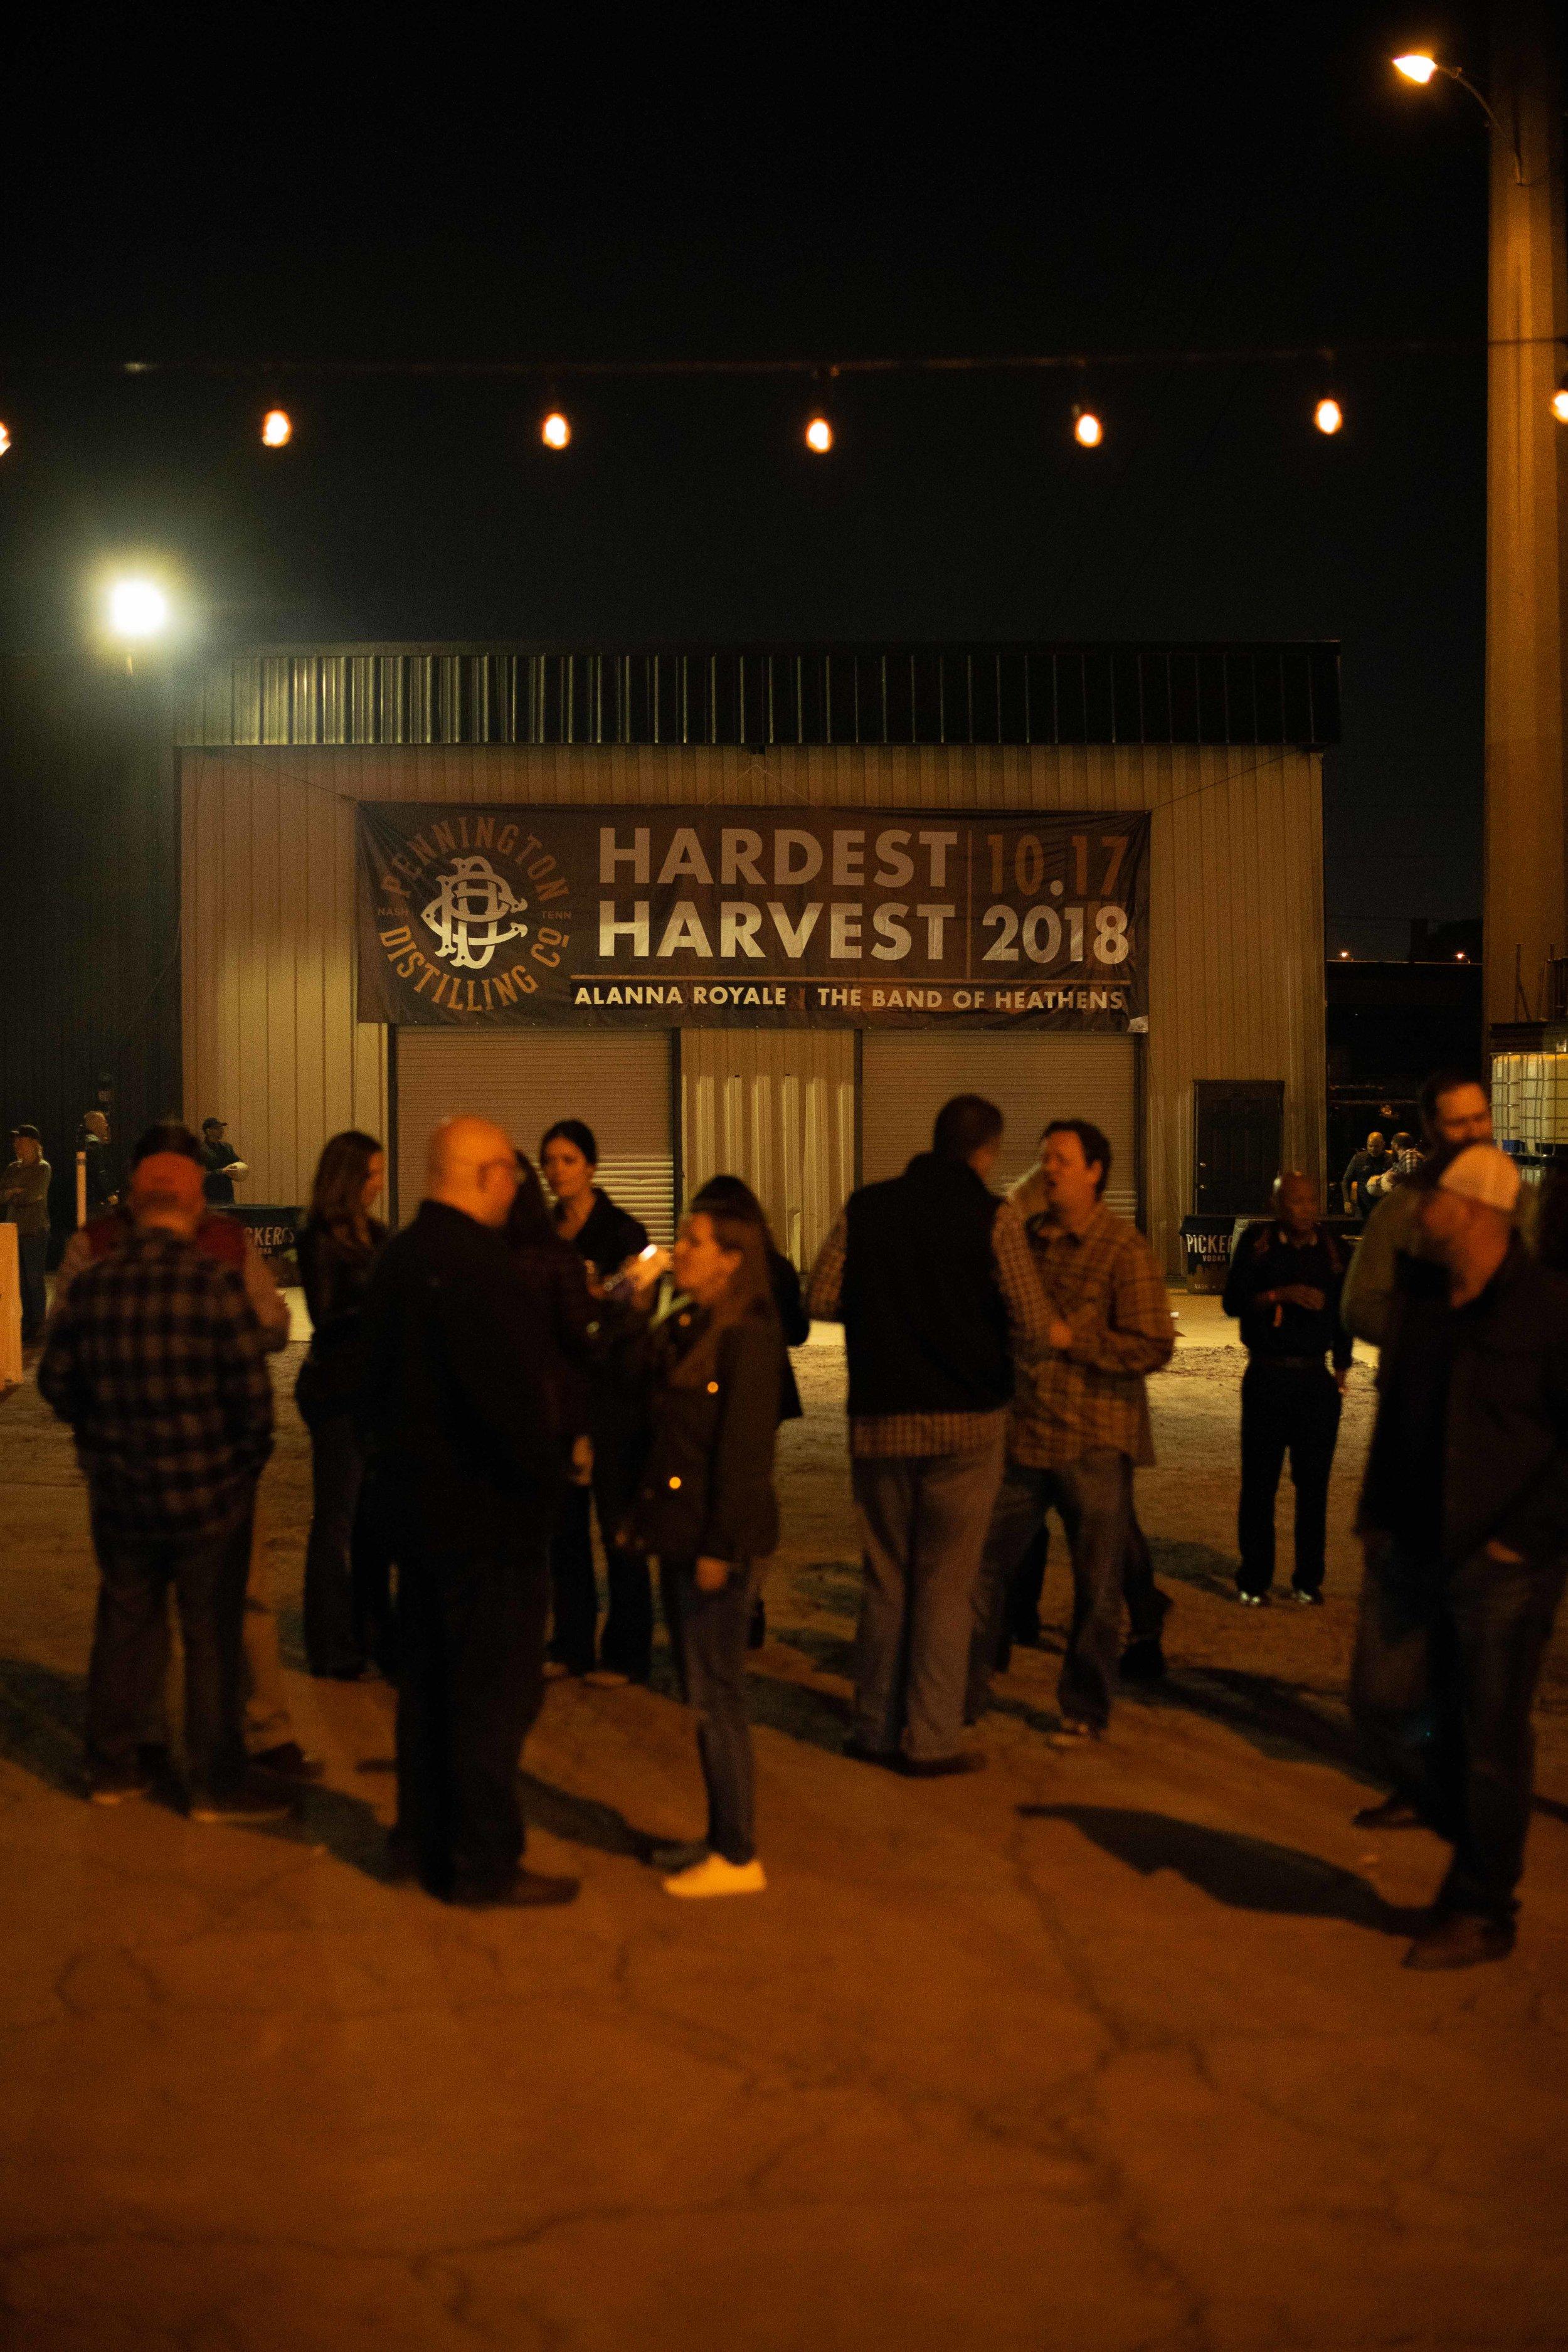 2018-10-17 Penningtons - Hardest Harvest-3557.jpg